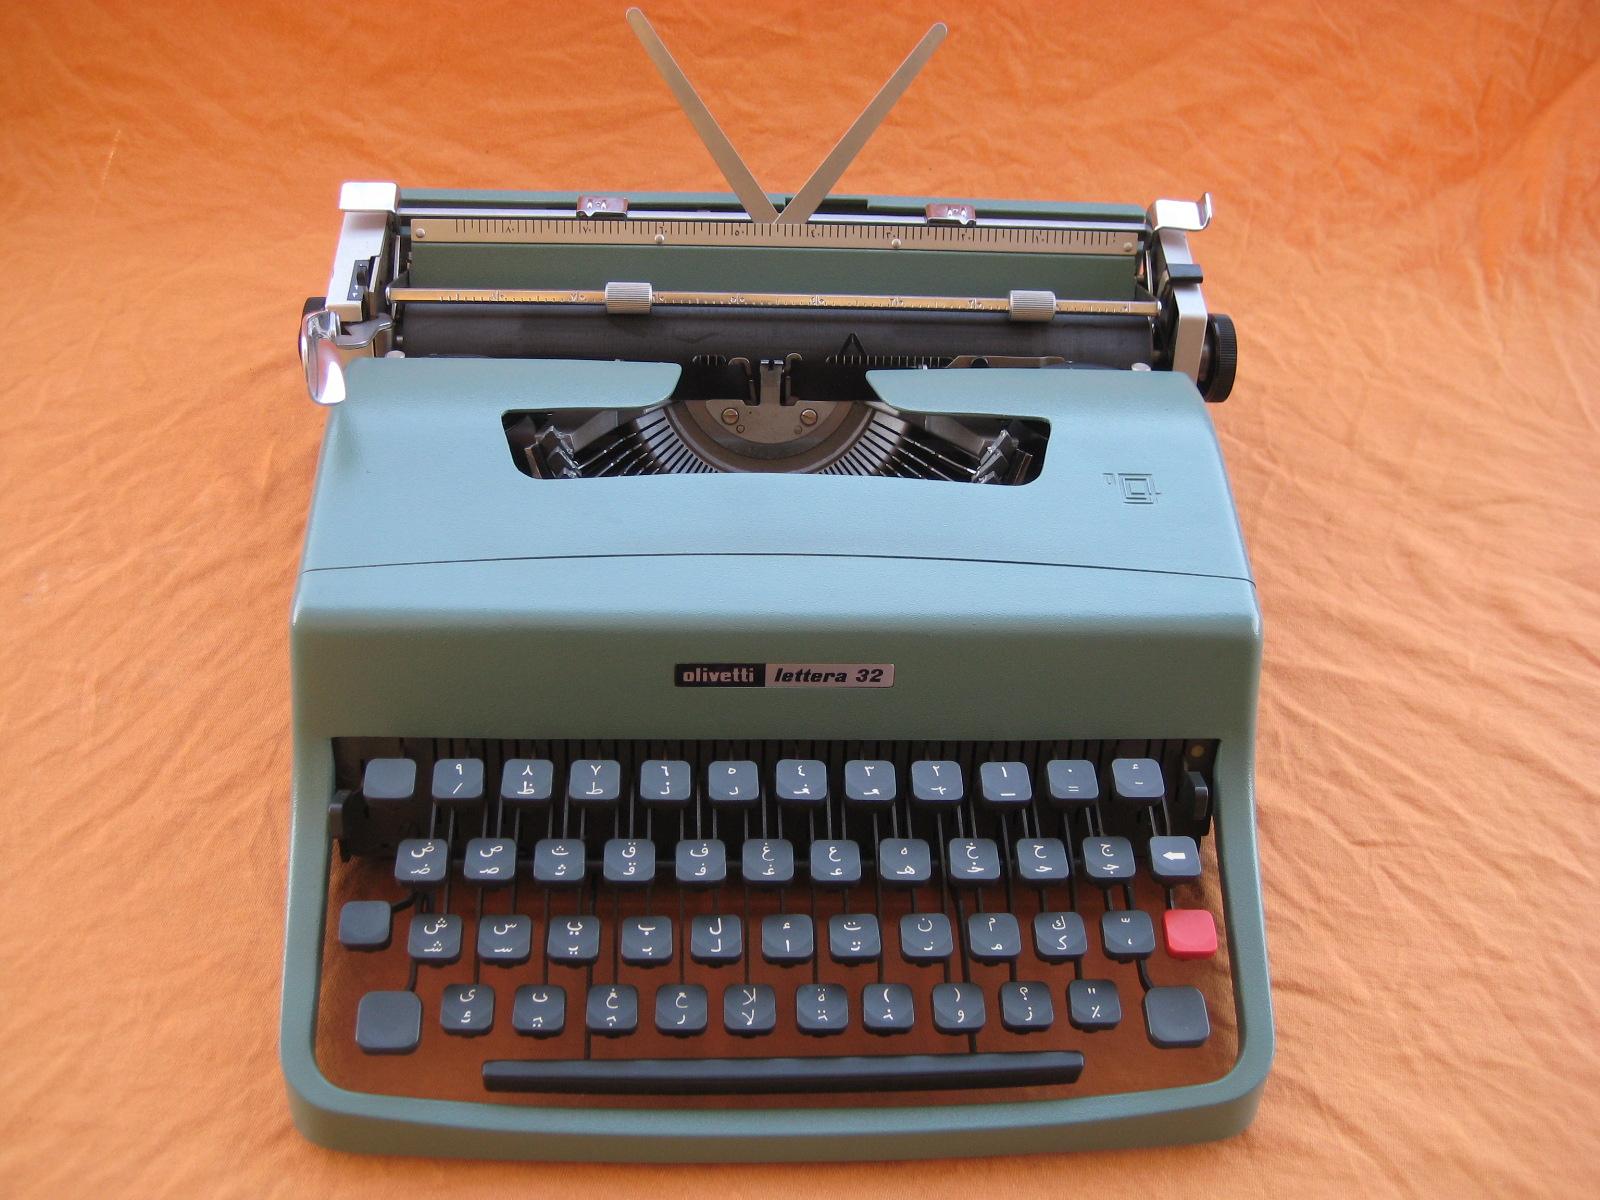 retro tech geneva olivetti lettera 32 portable manual typewriter rh genevatypewriters blogspot com buy manual typewriters online where to buy manual typewriter in the philippines